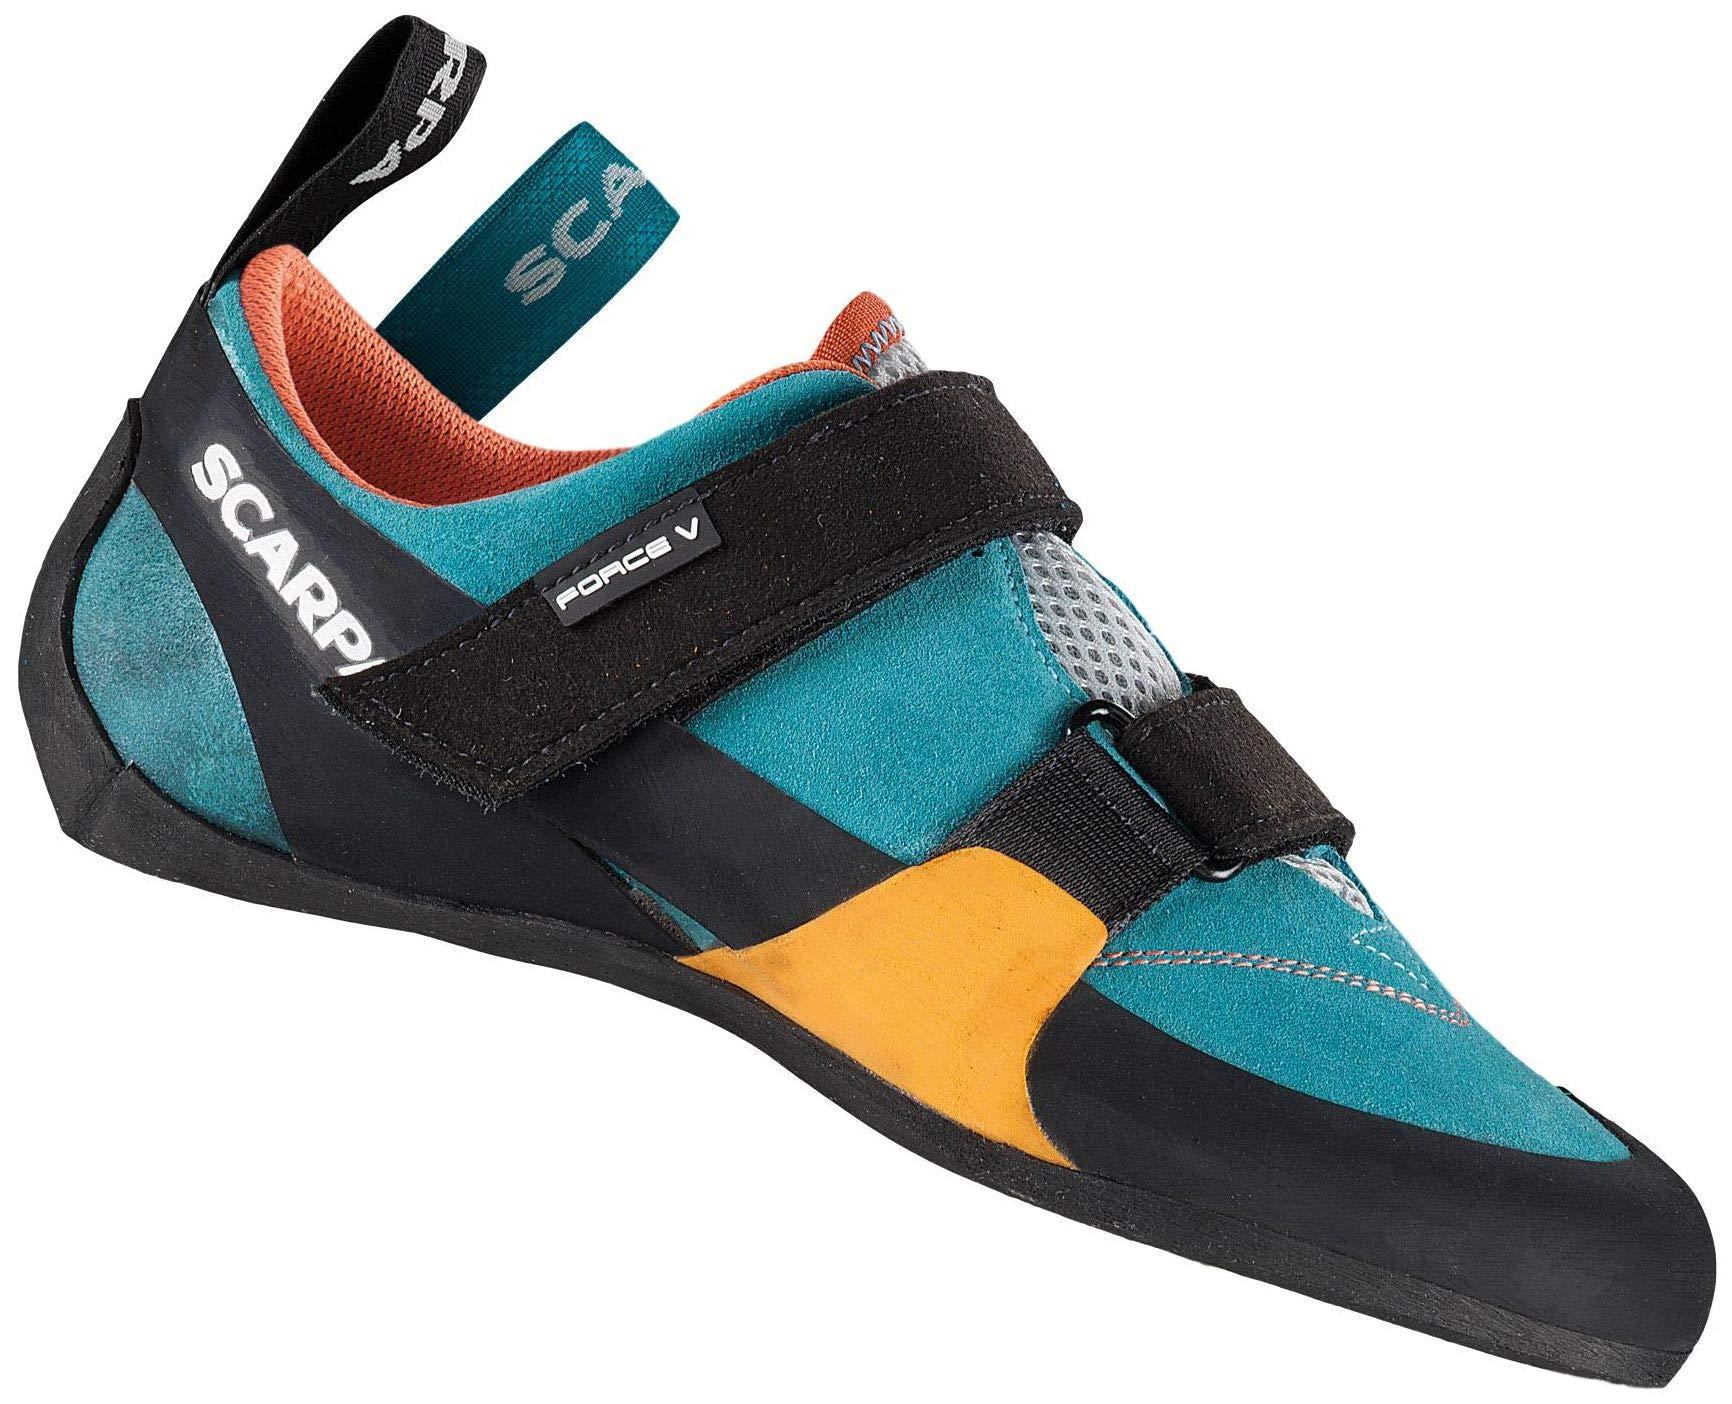 SCARPA Force V Climbing Shoe - Women's Ice Fall/Mandarin Red41.5 by SCARPA